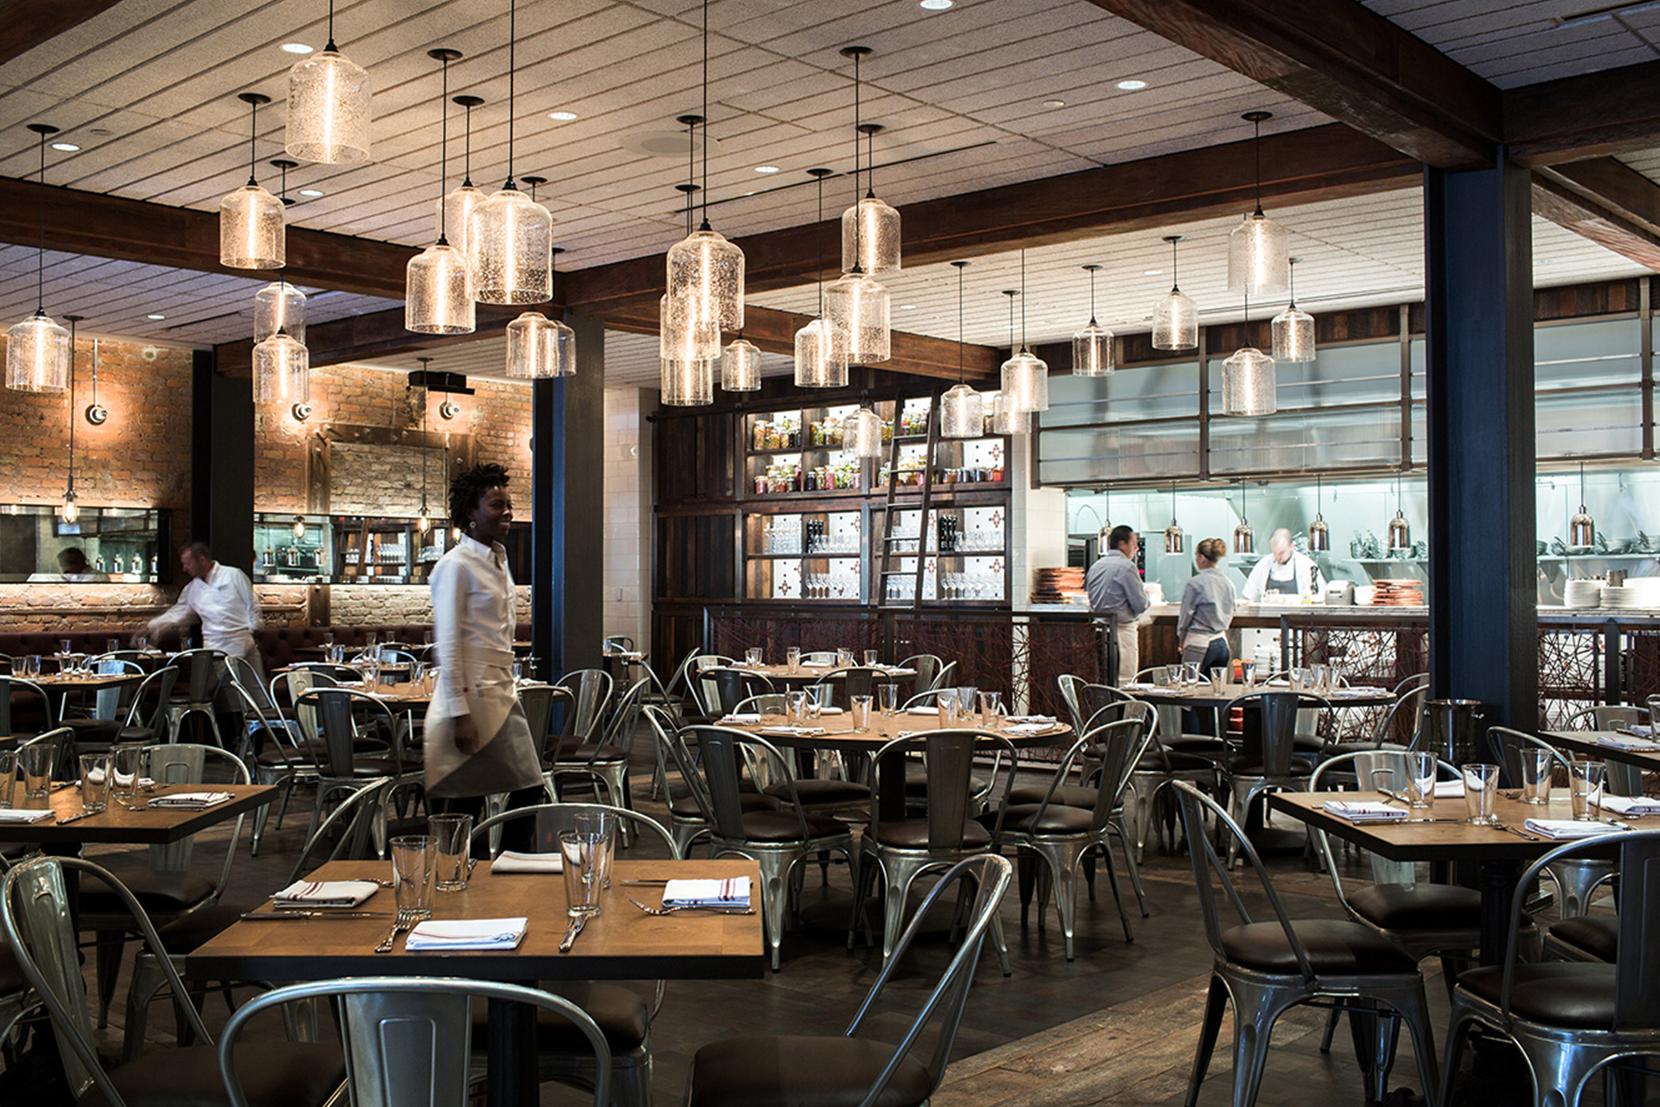 Modern Glass Restaurant Lighting - Effervescent Bell Jar Pendant Lights